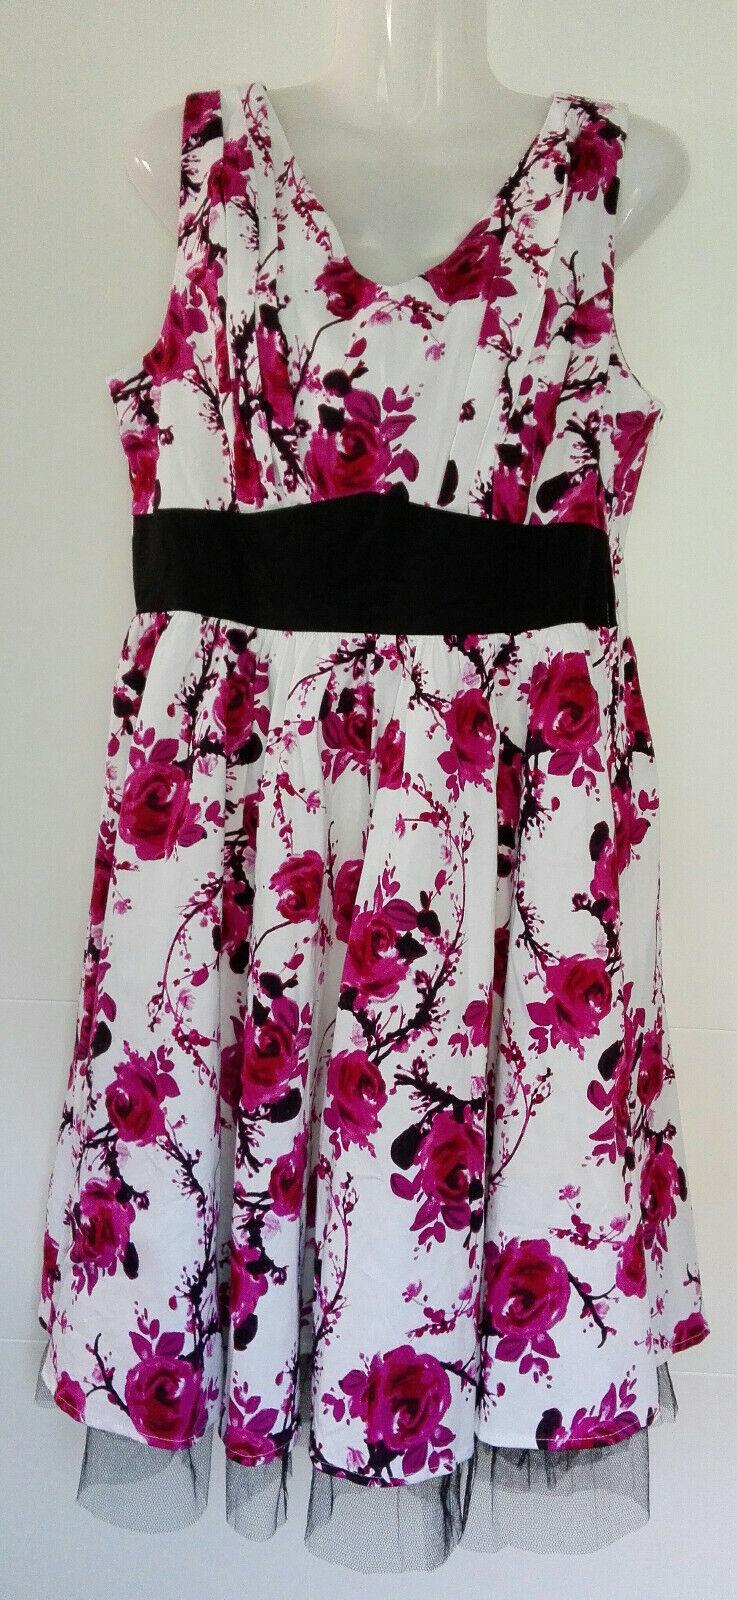 Damen Hearts & Rosas Kleid Rockabilly Swing Tüll Retro geblümt Rosa weiß Gr. 42